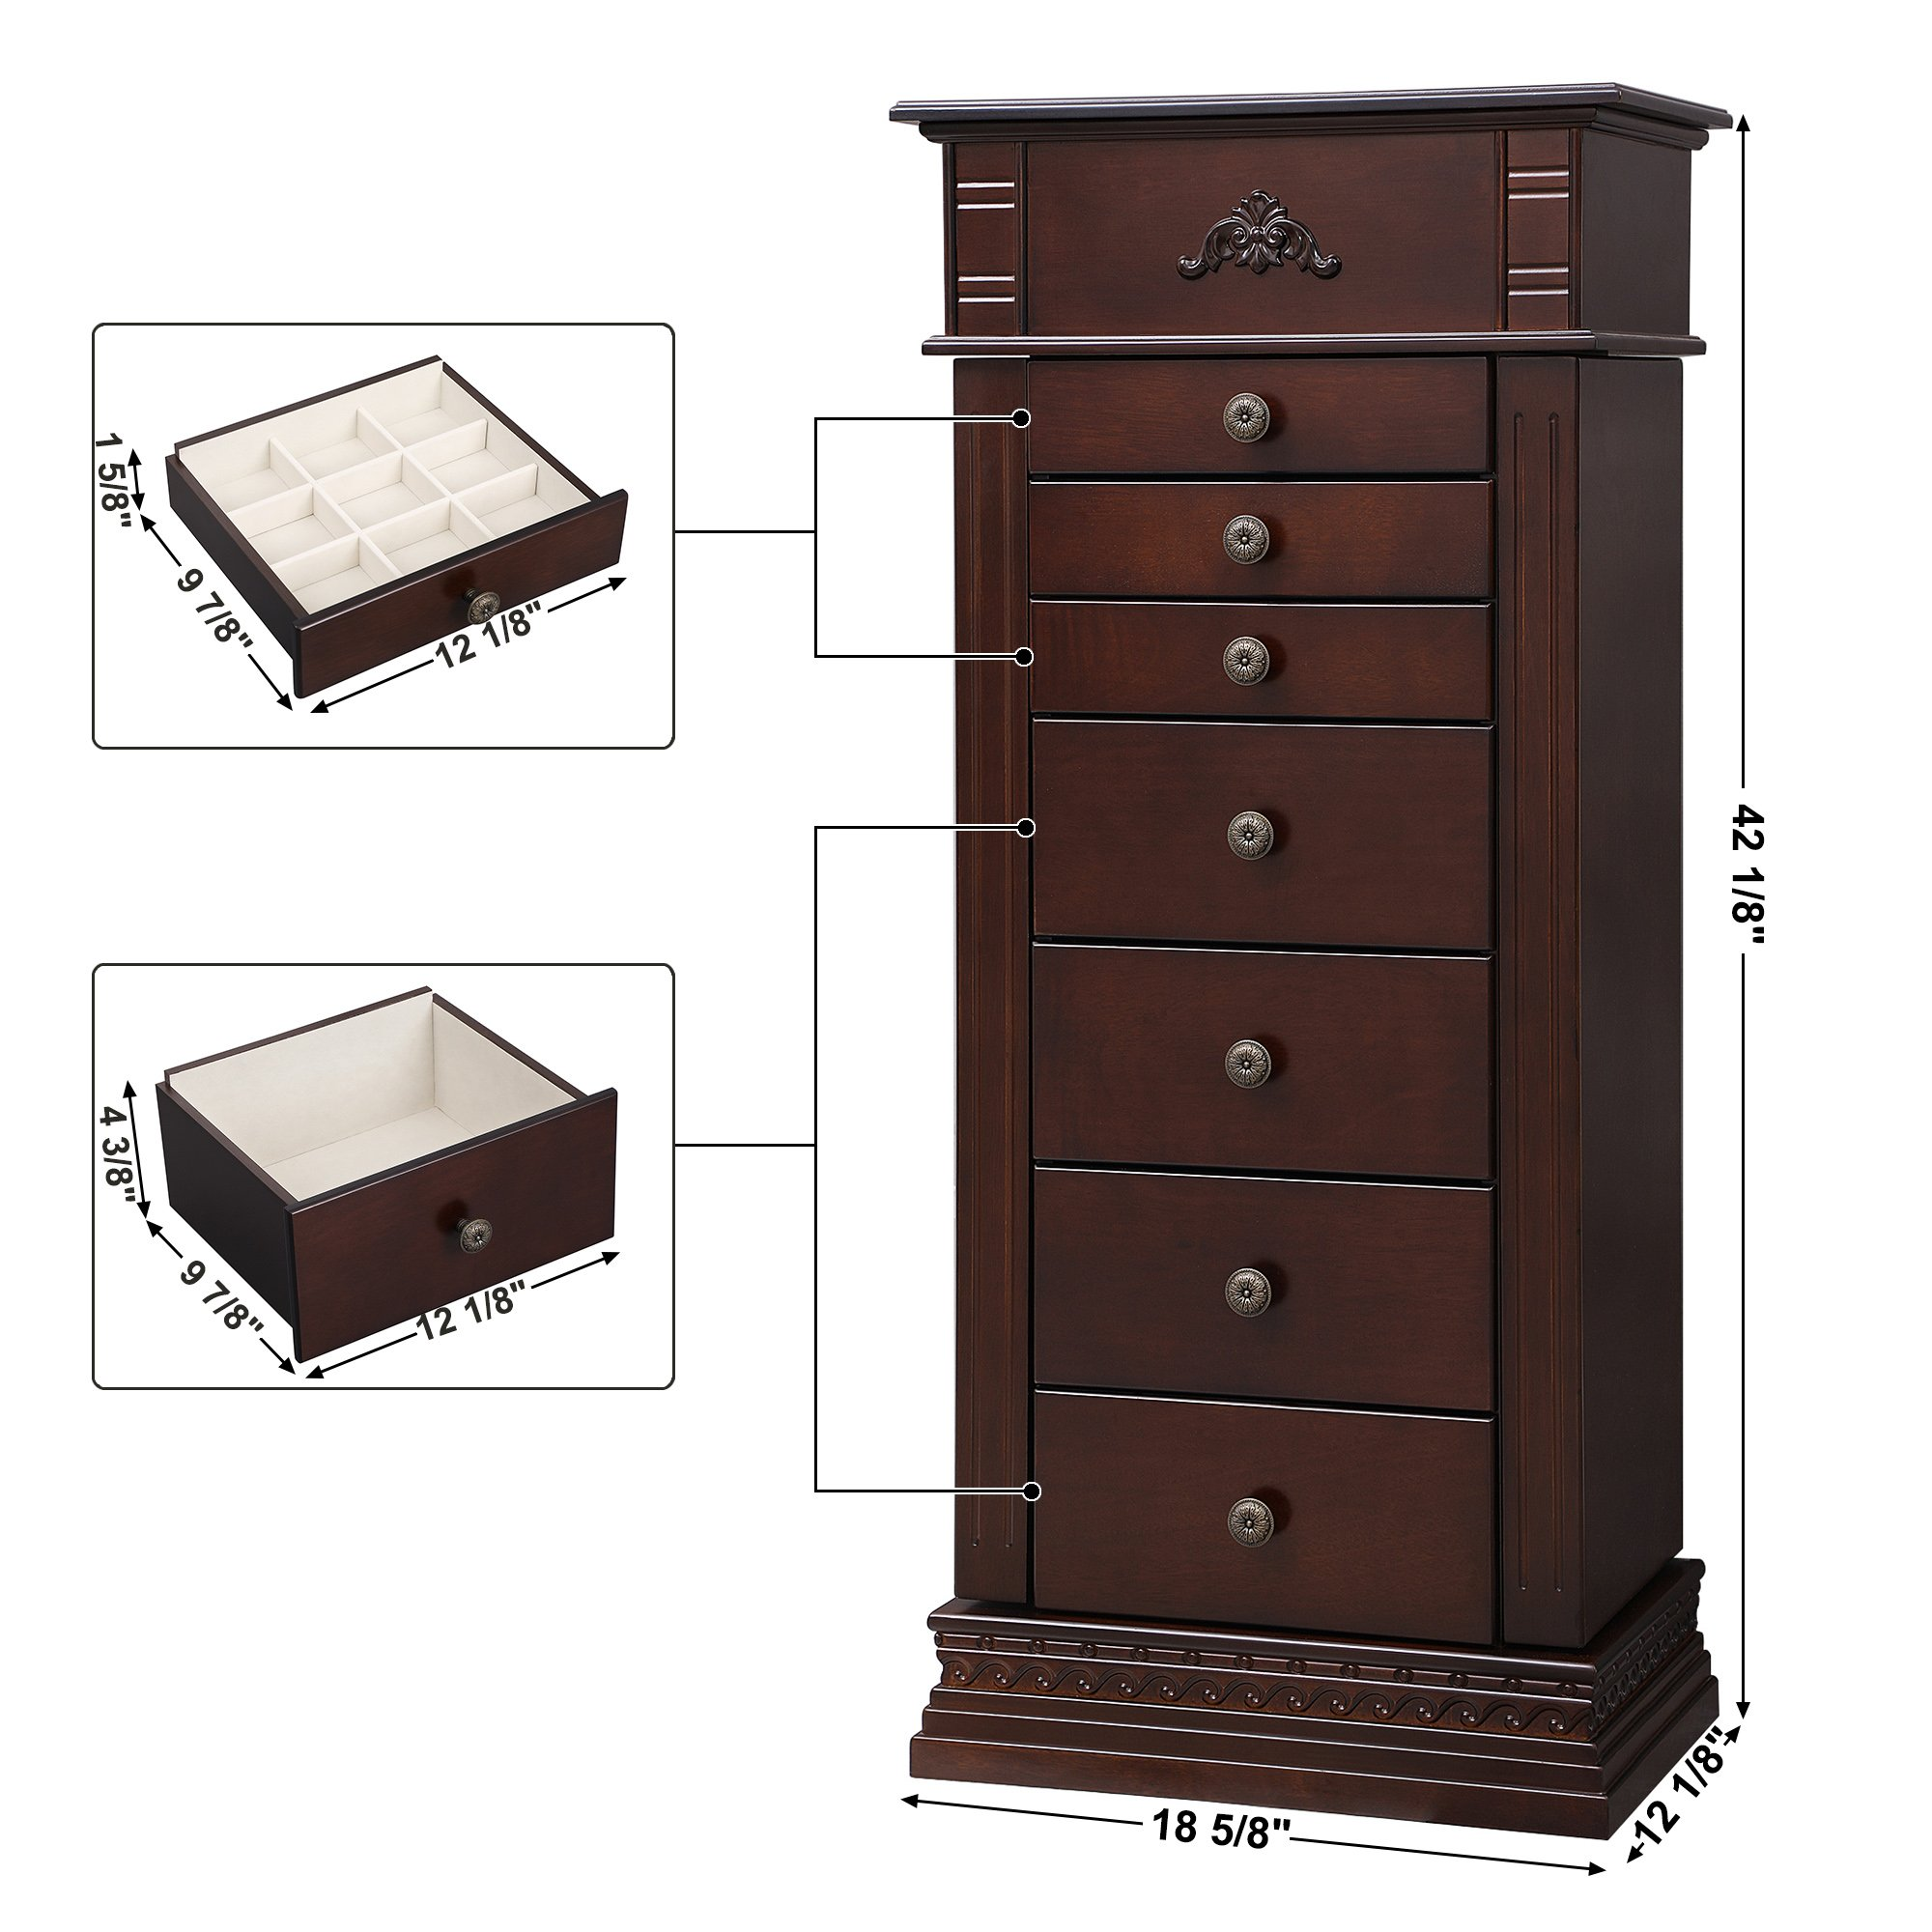 SONGMICS Large Jewelry Armoire Cabinet Standing Storage Chest Neckalce Organizer Dark Walnut UJJC14K by SONGMICS (Image #7)